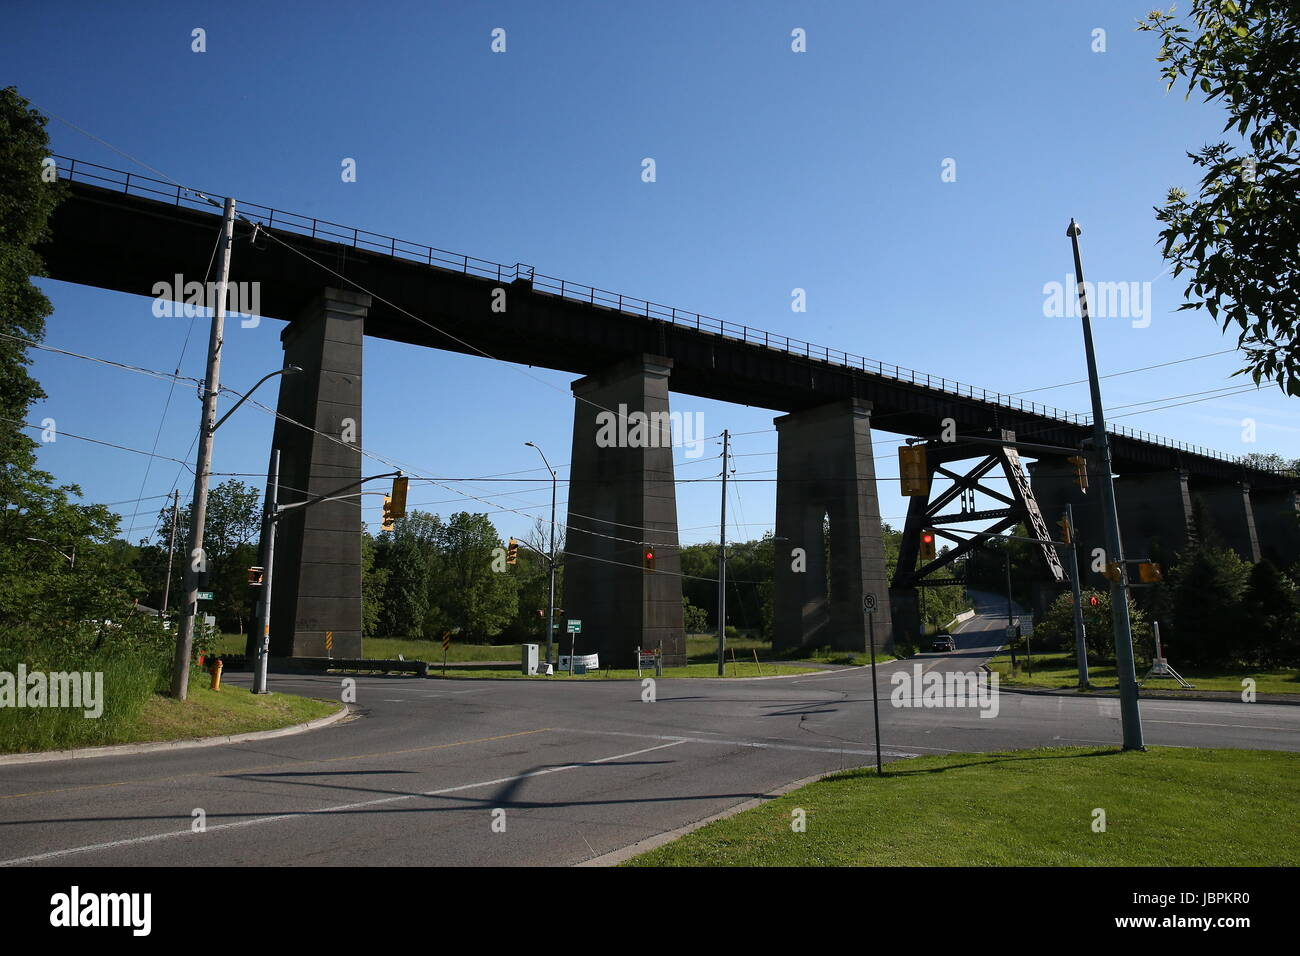 St Thomas Ontario, Canada, MCR bridge soon to be an elevated park - Stock Image